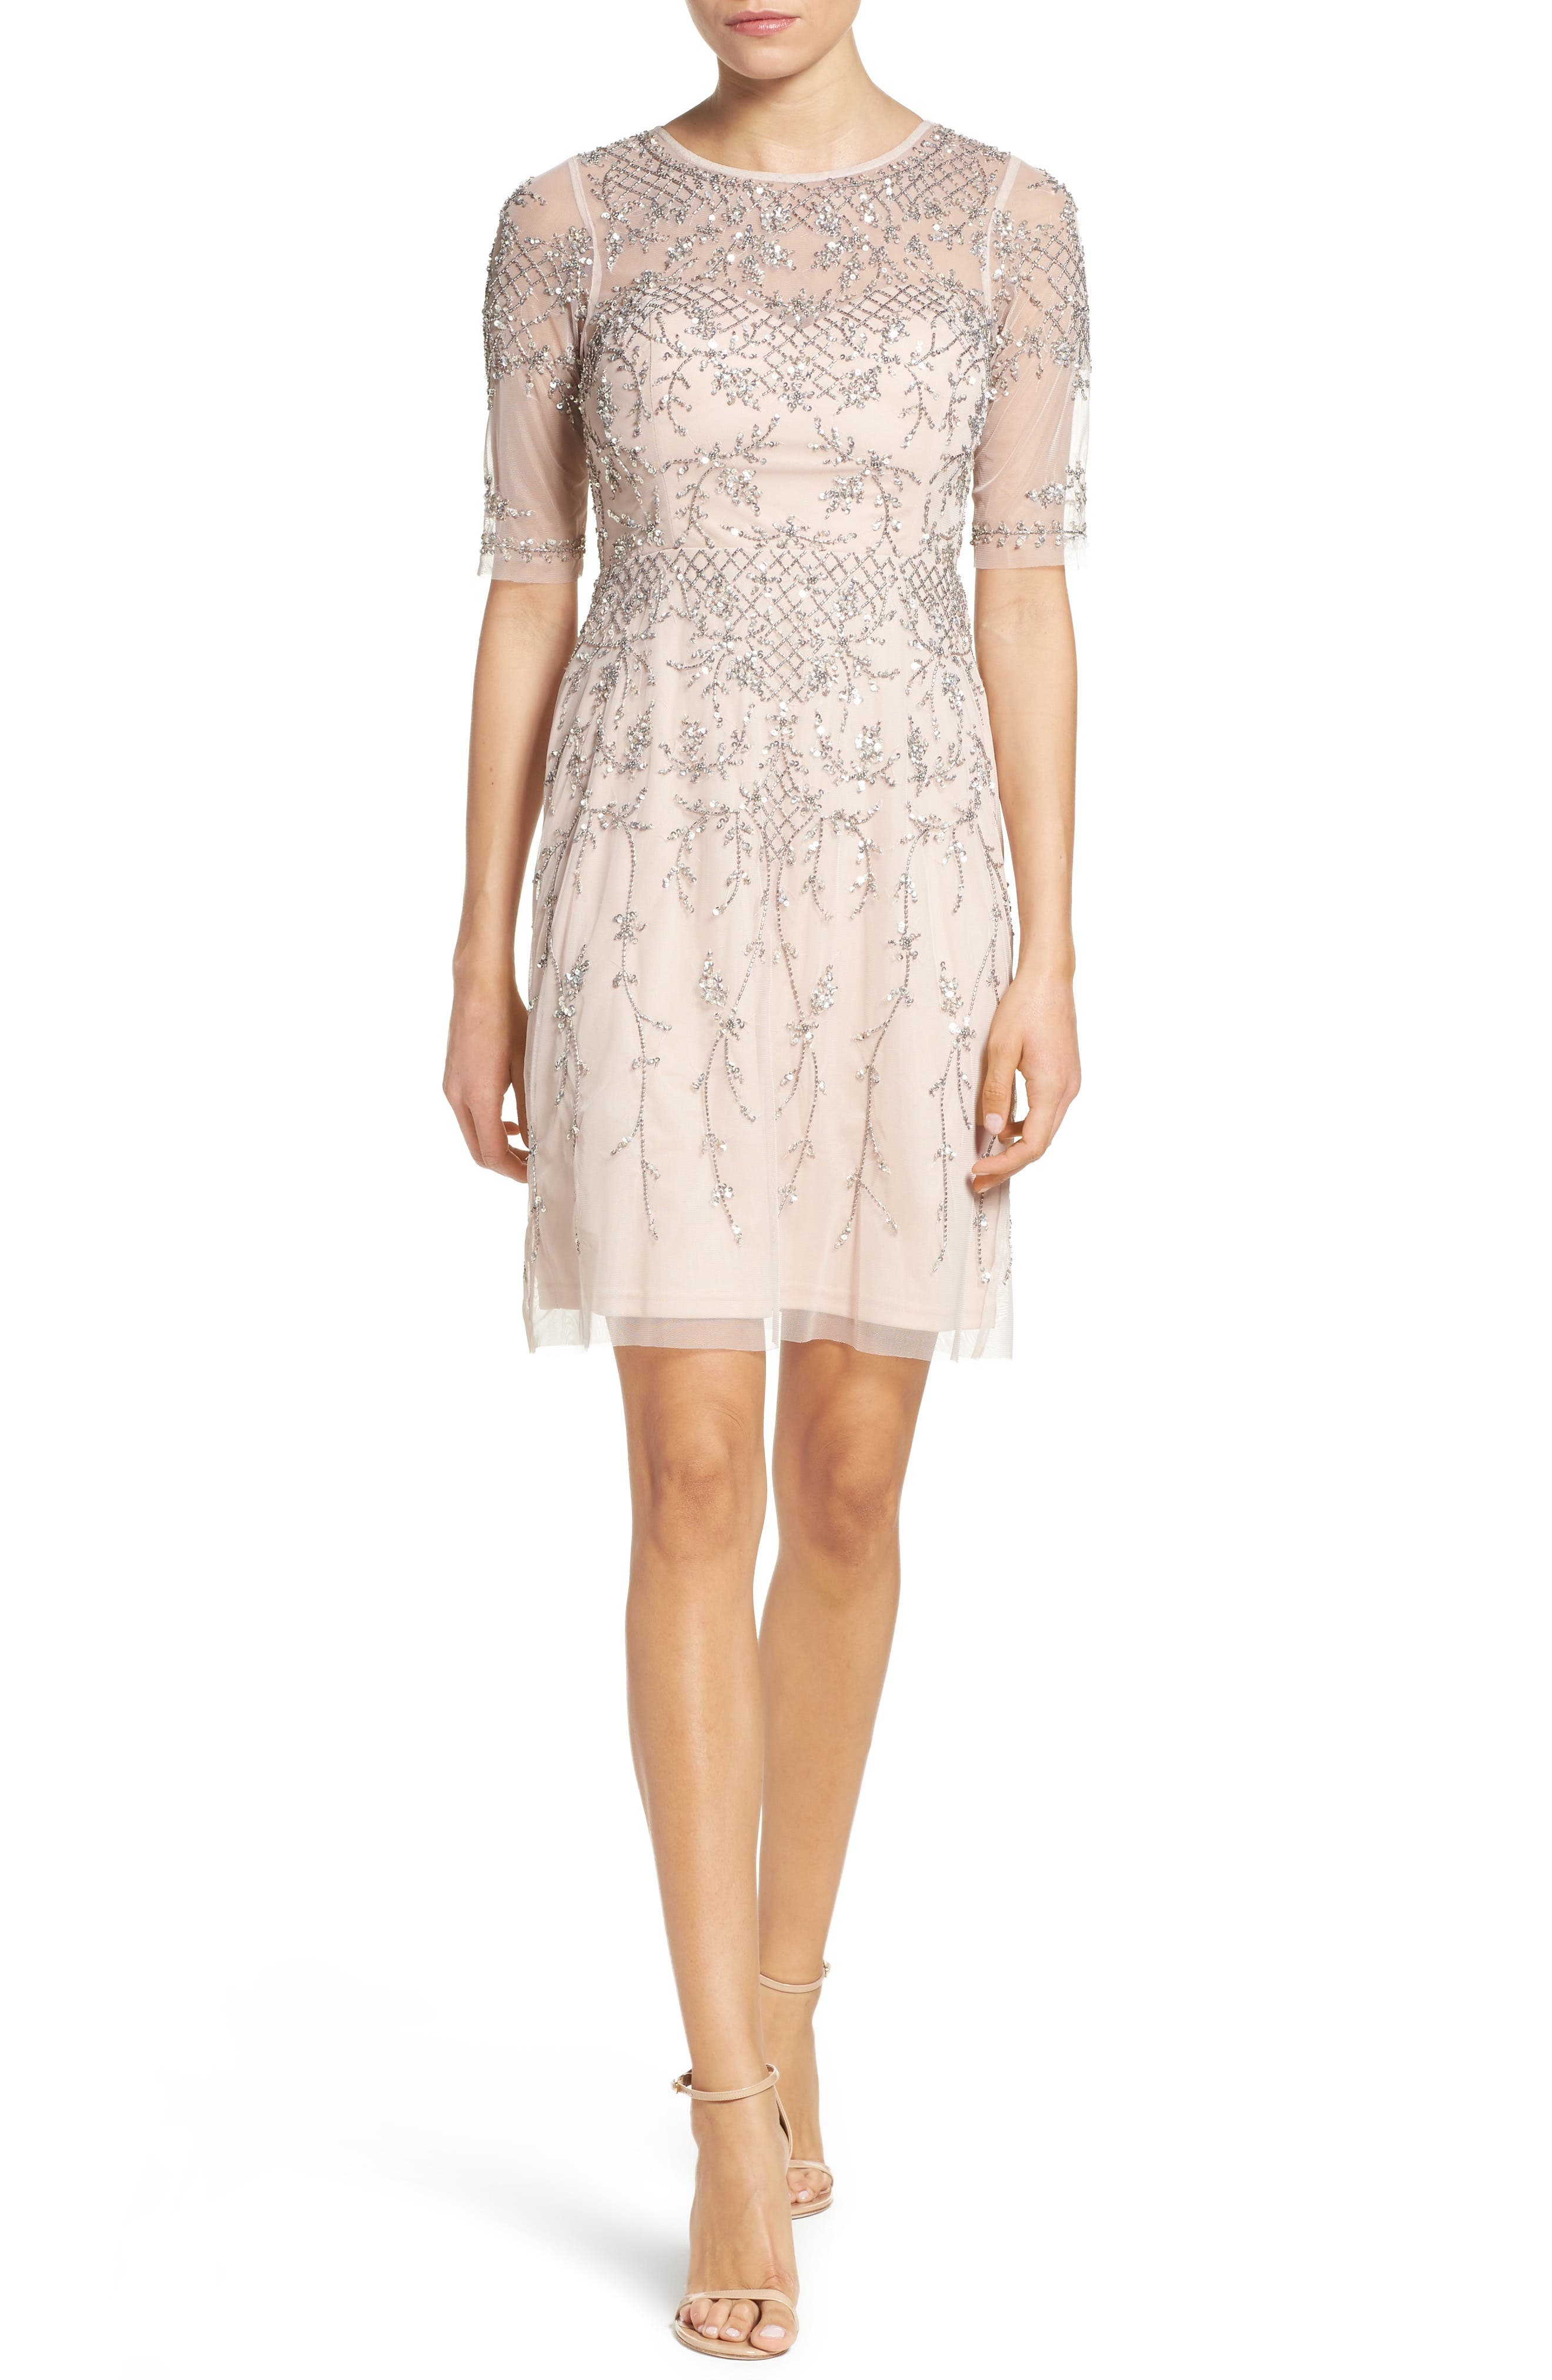 Main Image - Adrianna Papell Embellished Fit & Flare Dress (Regular & Petite)